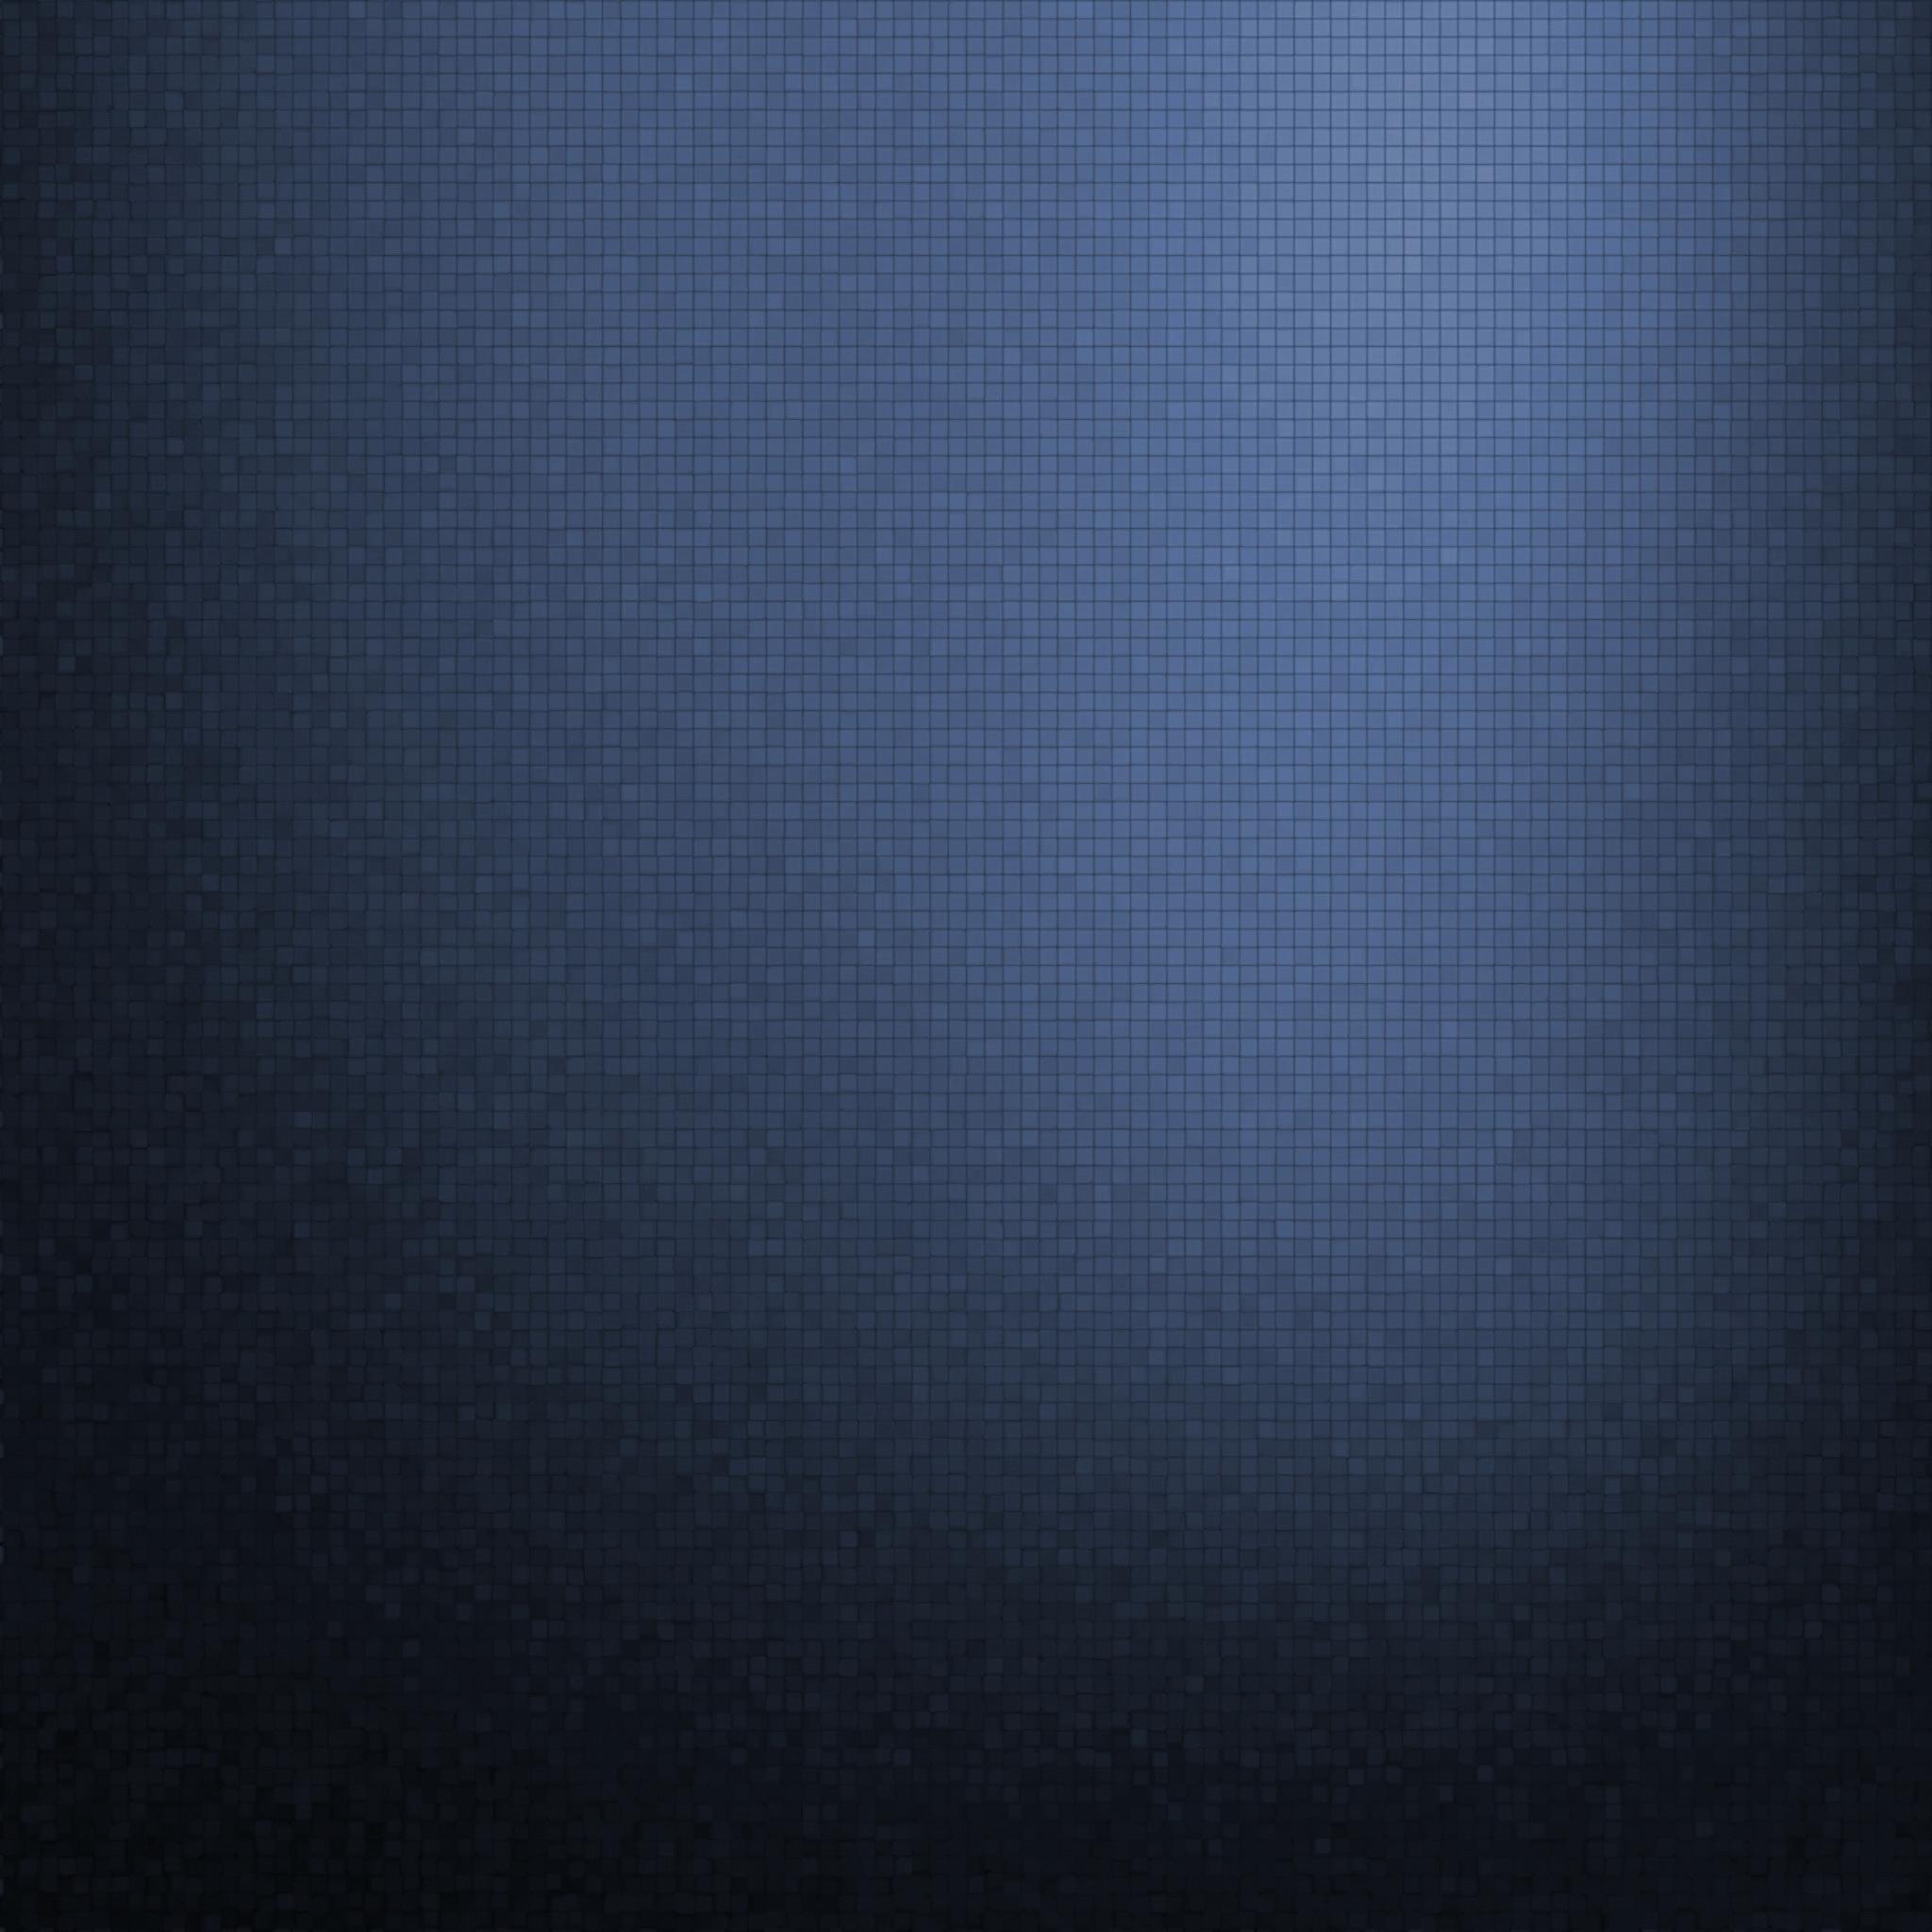 provide you retina ipad air wallpapers retina ipad mini 2 wallpapers 2048x2048